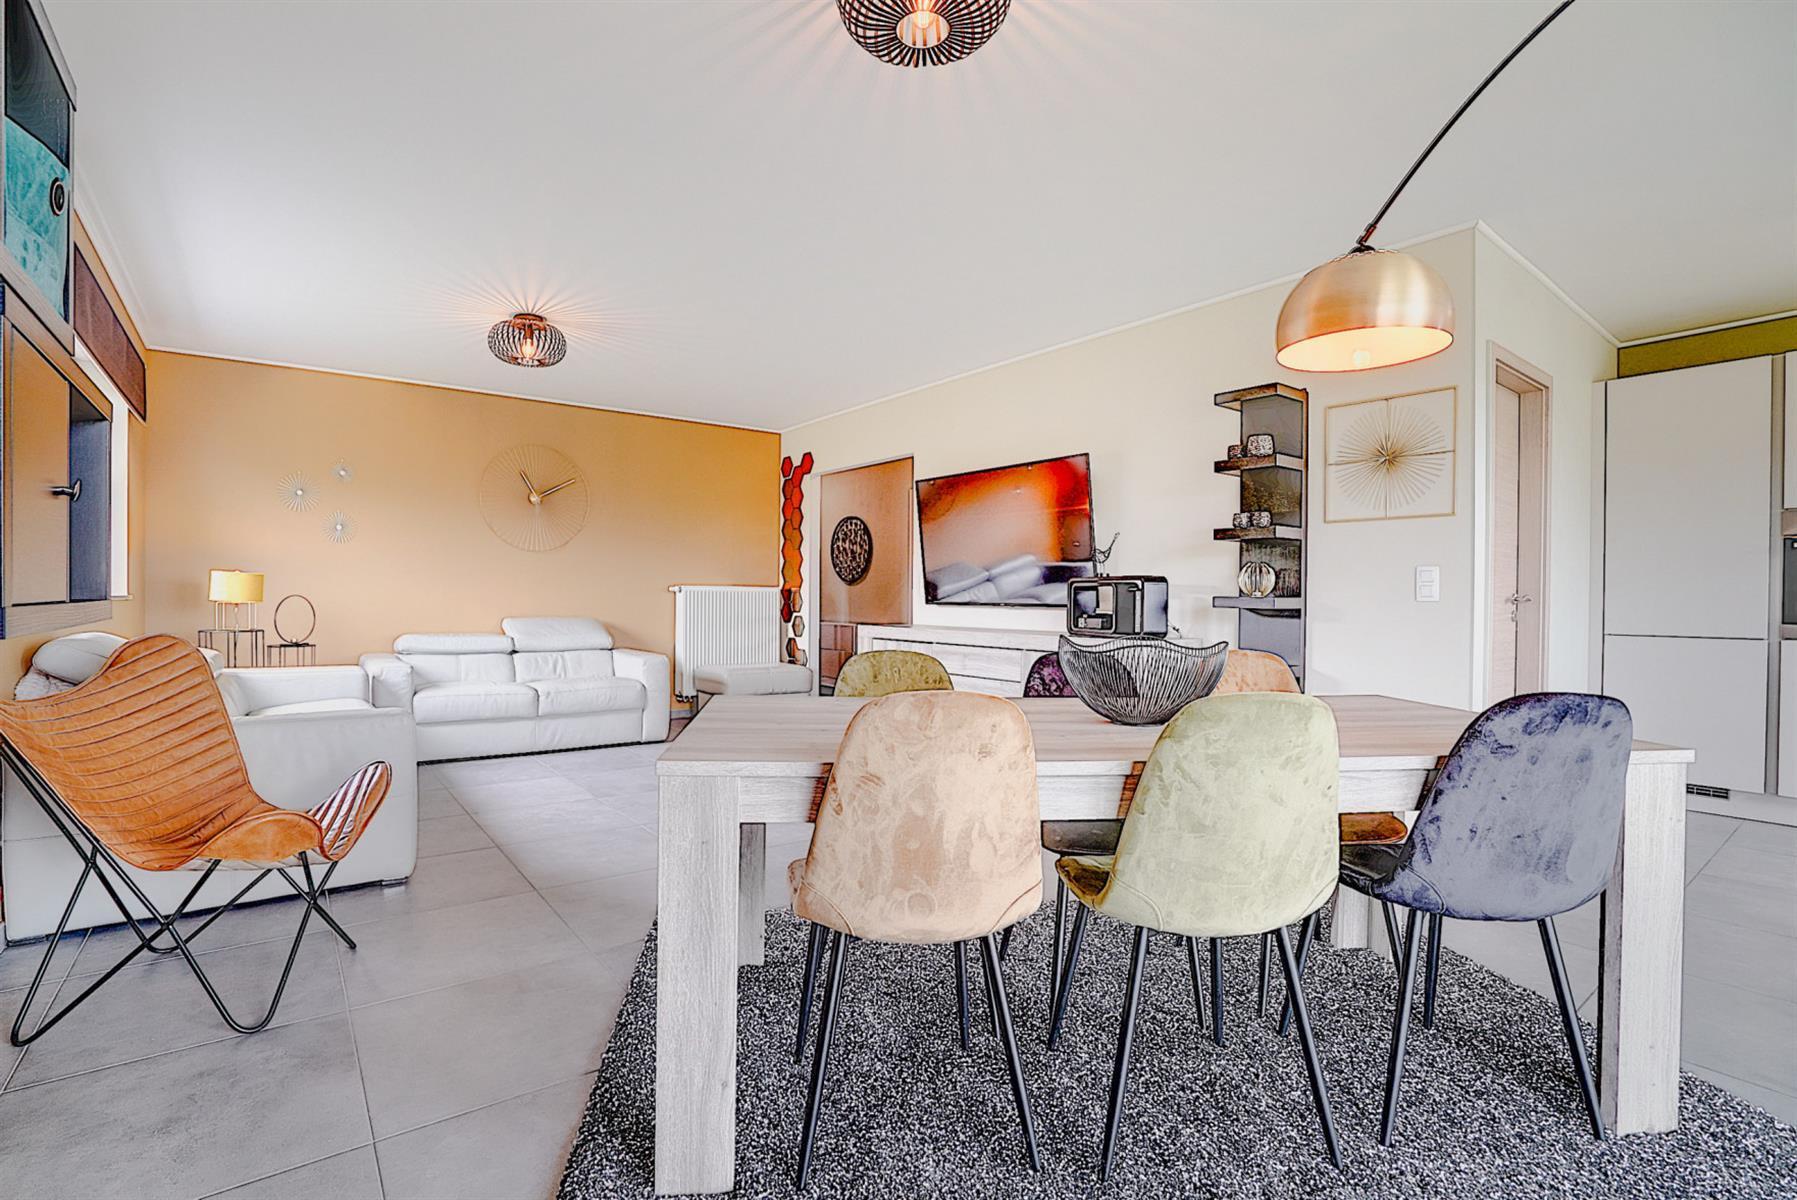 Appartement - Grâce-hollogne - #4364483-2